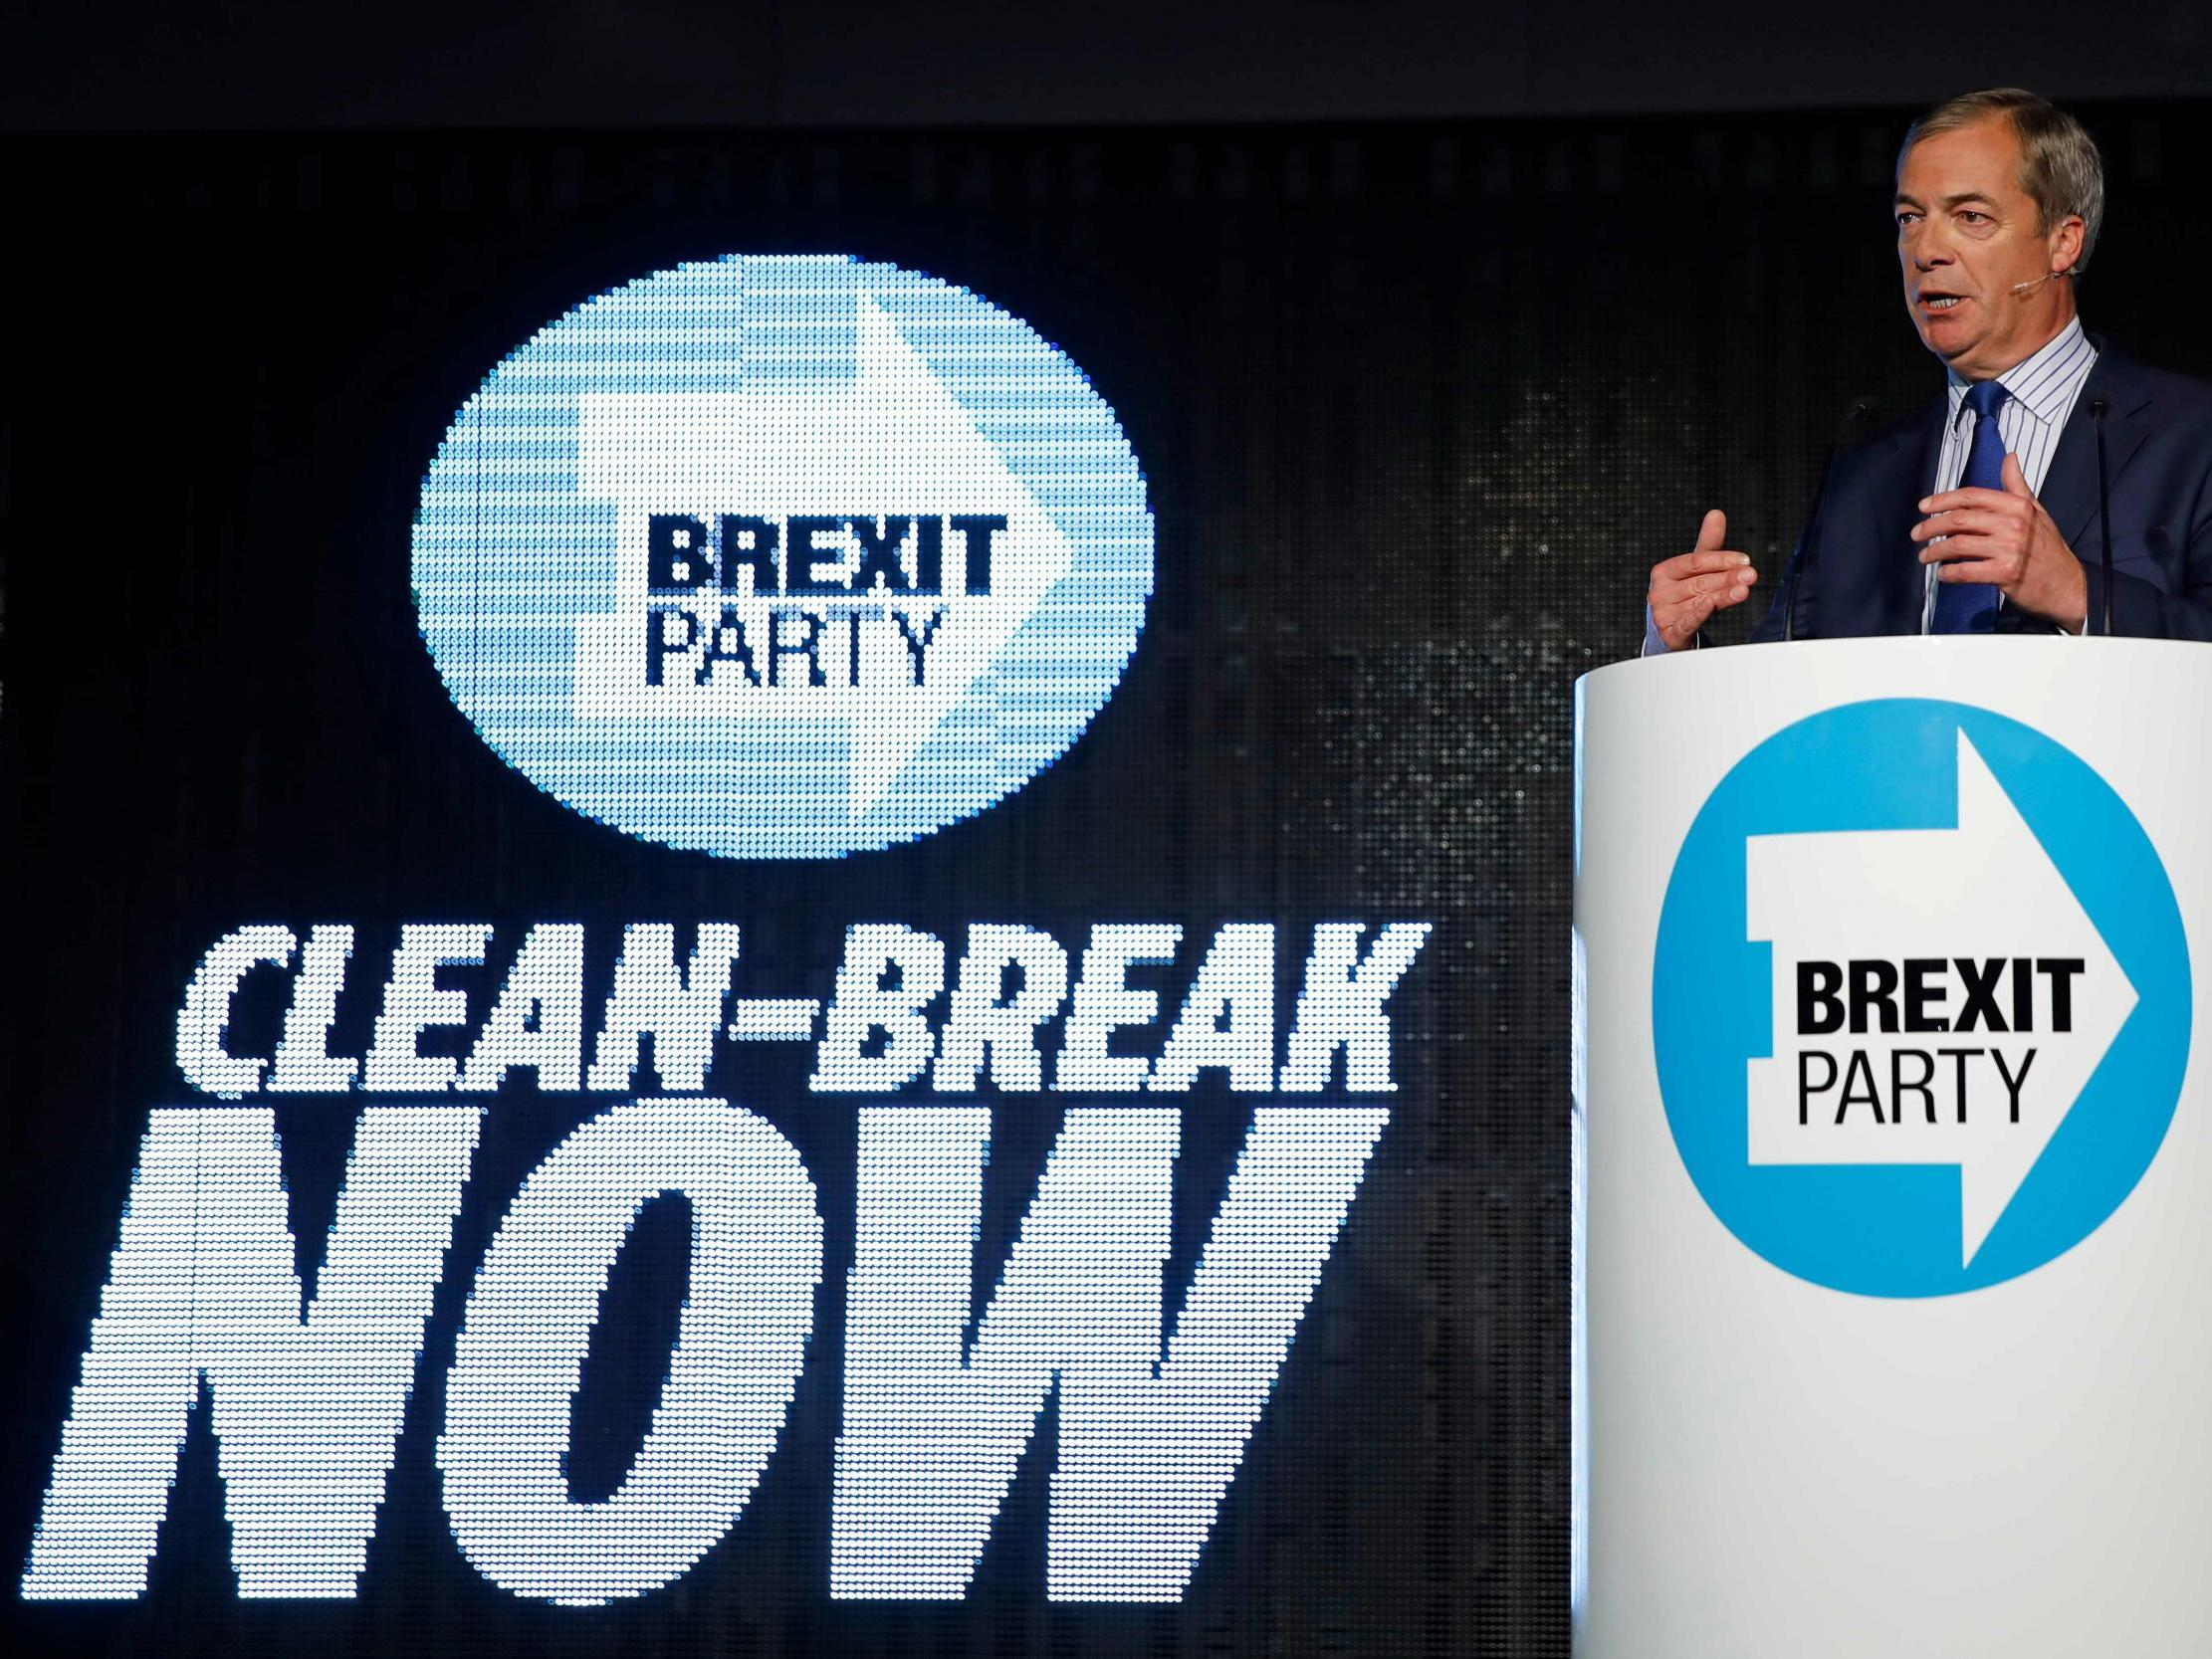 Brexit: Nigel Farage praises EU negotiator Michel Barnier for role in Johnson deal